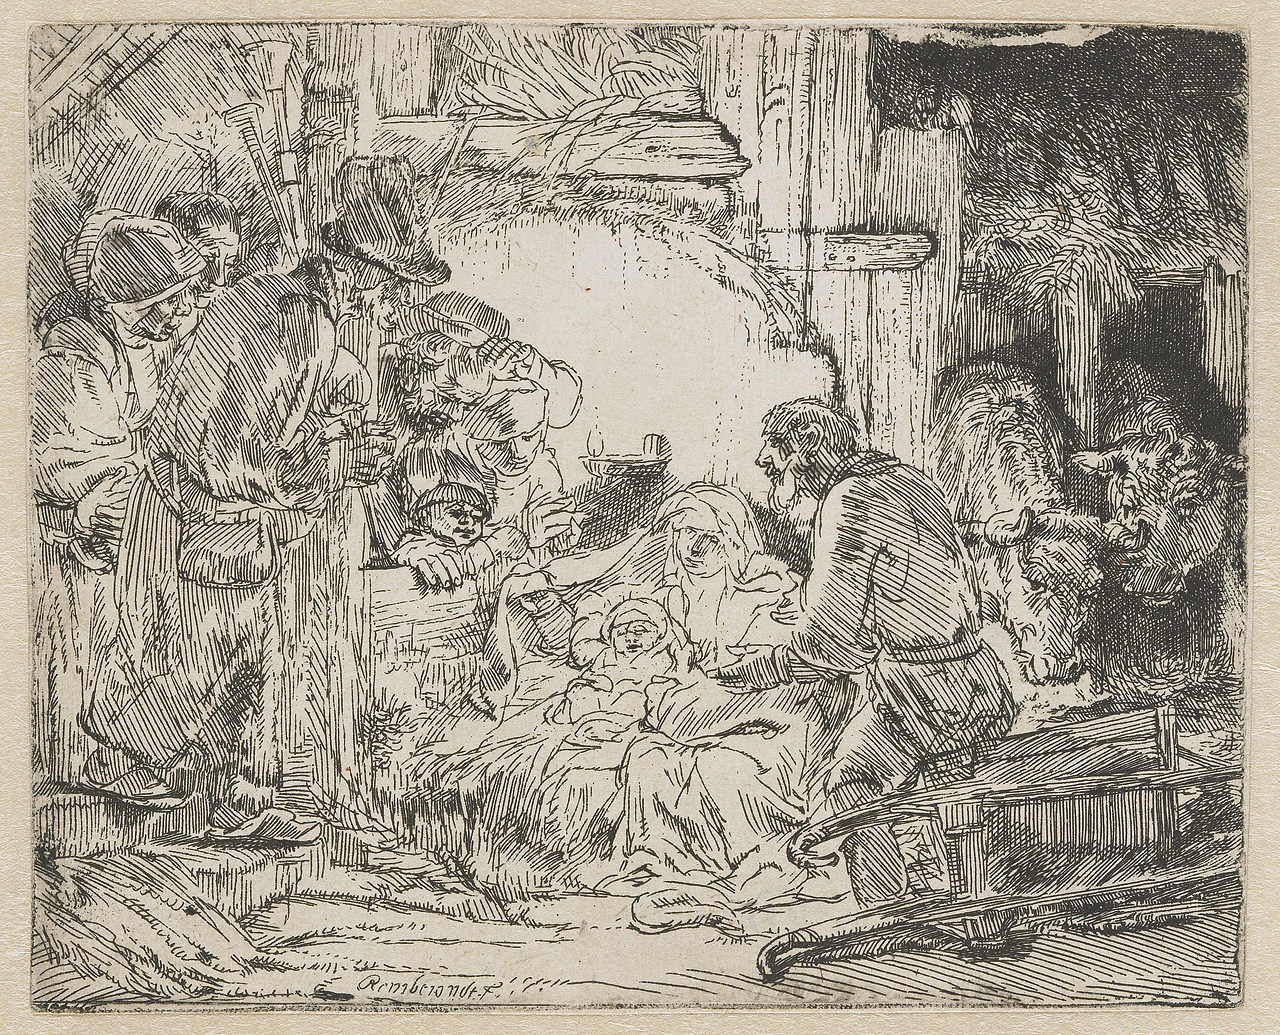 1280x1035 The Nativity Through Rembrandt's Eyes